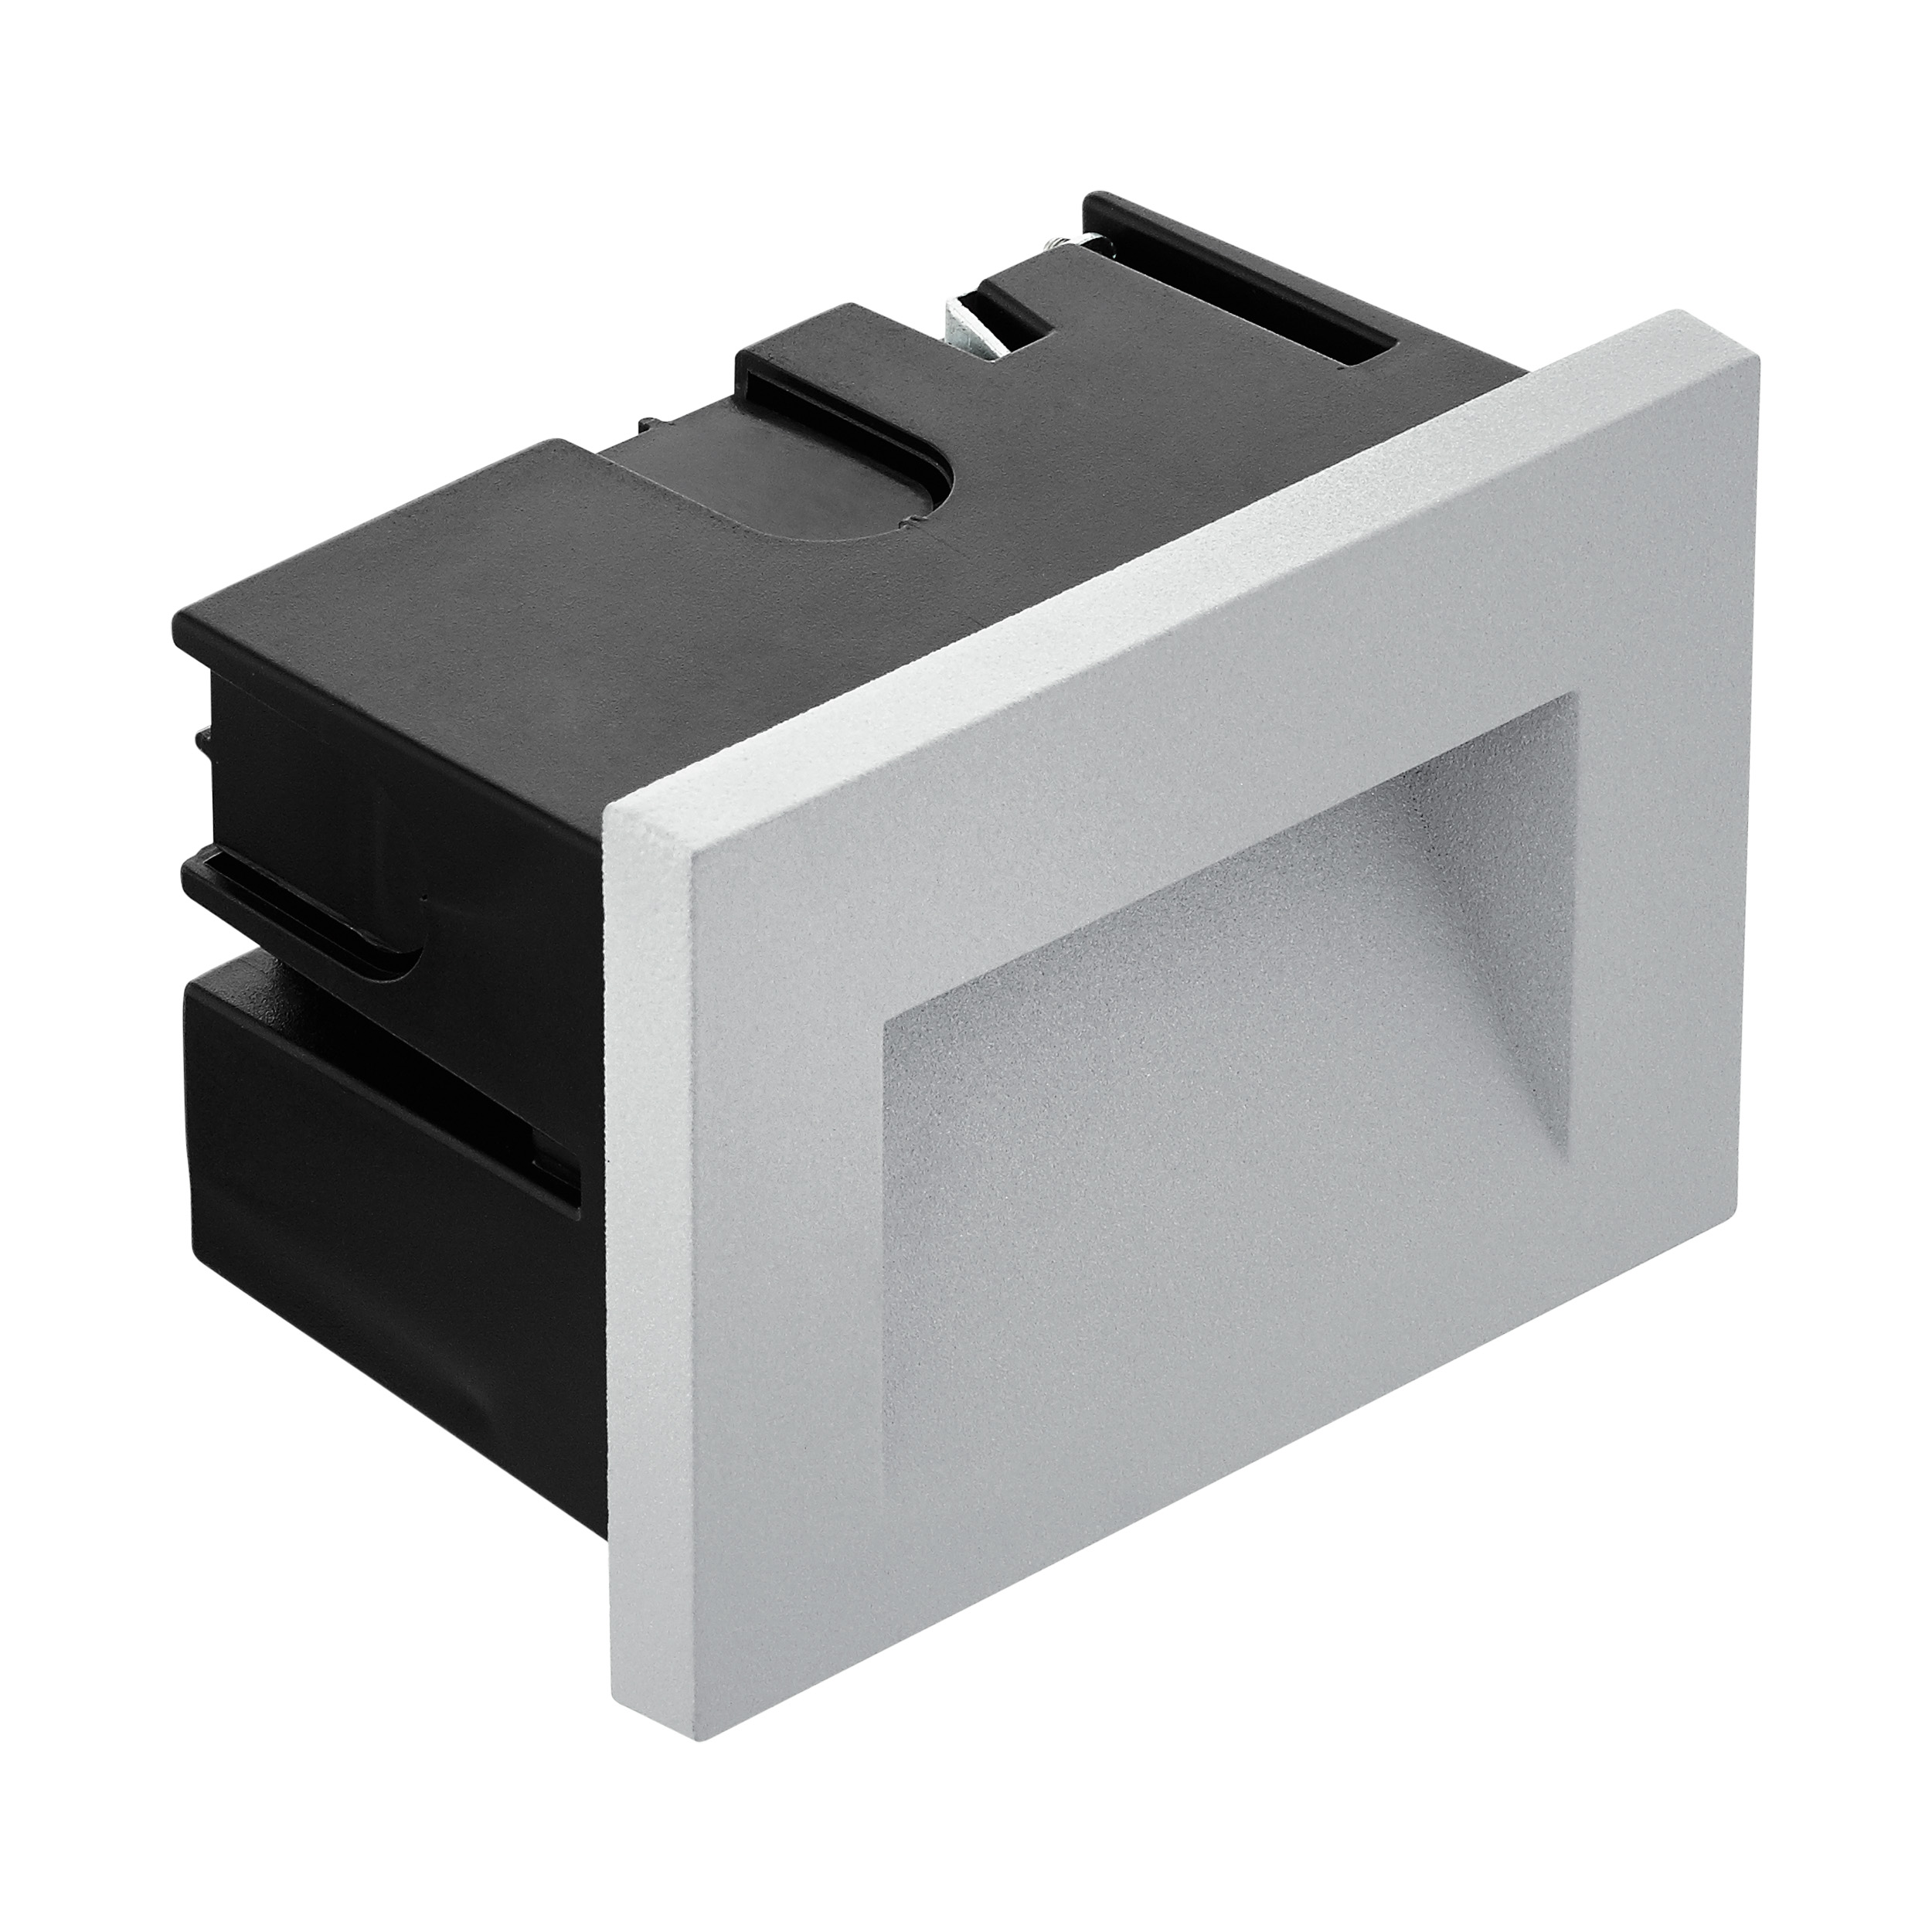 1 Stk Zimba Pro 3W 4000K silbergrau IP65 LI66267---